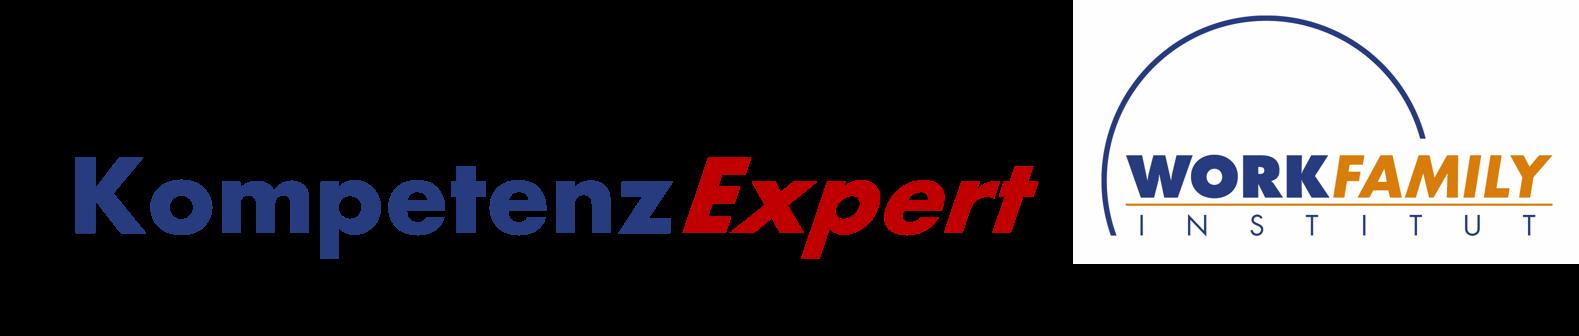 KompetenzExpert